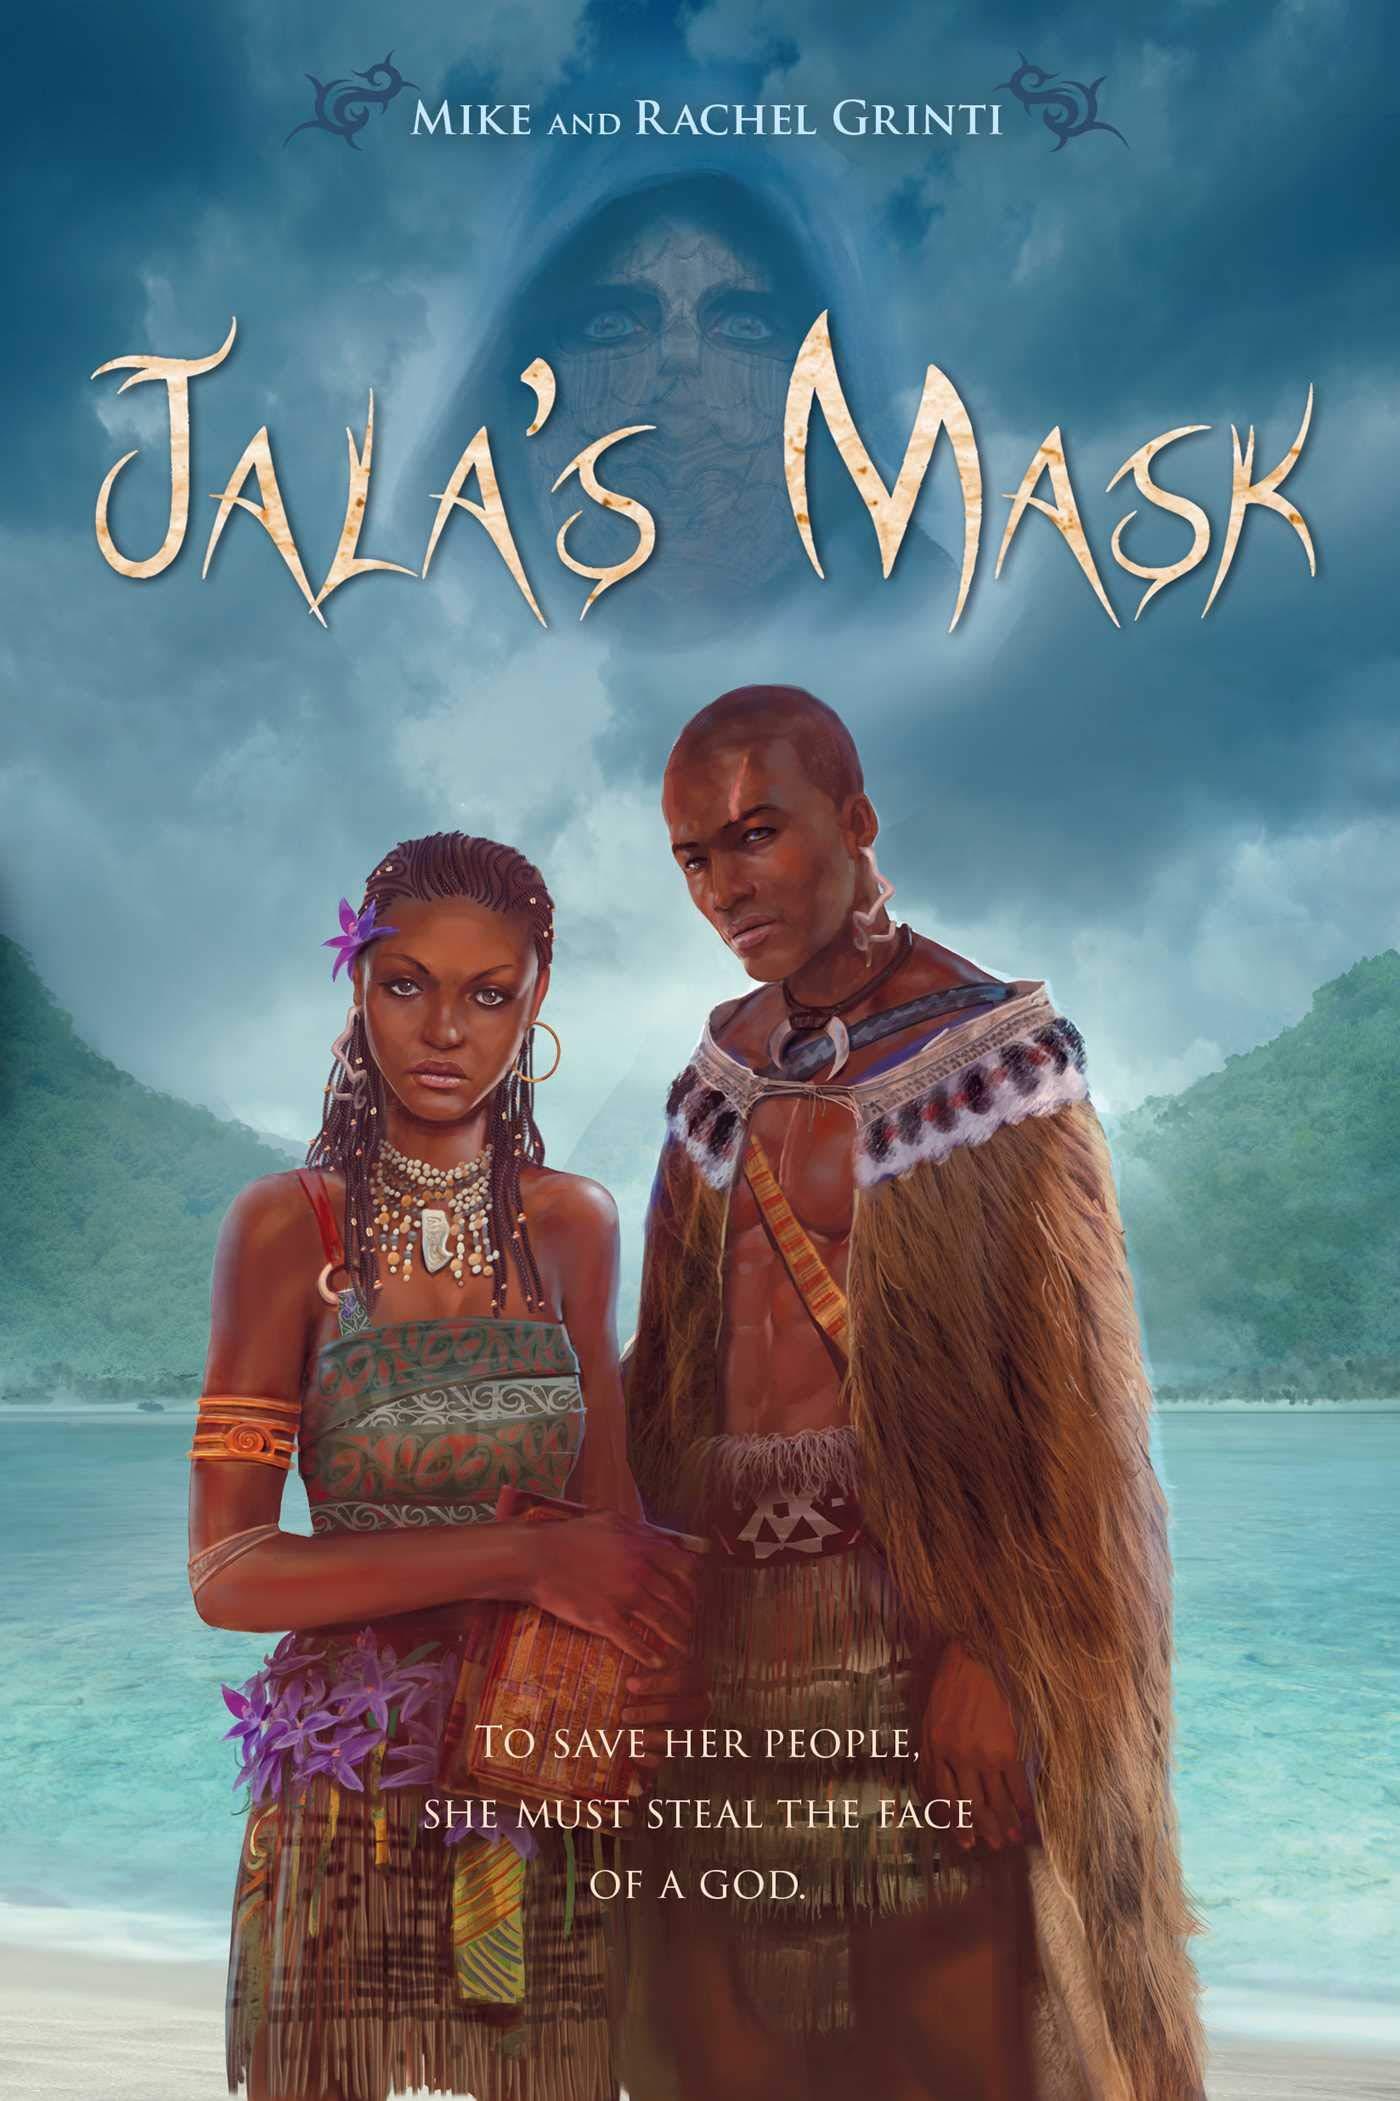 Jalas Mask